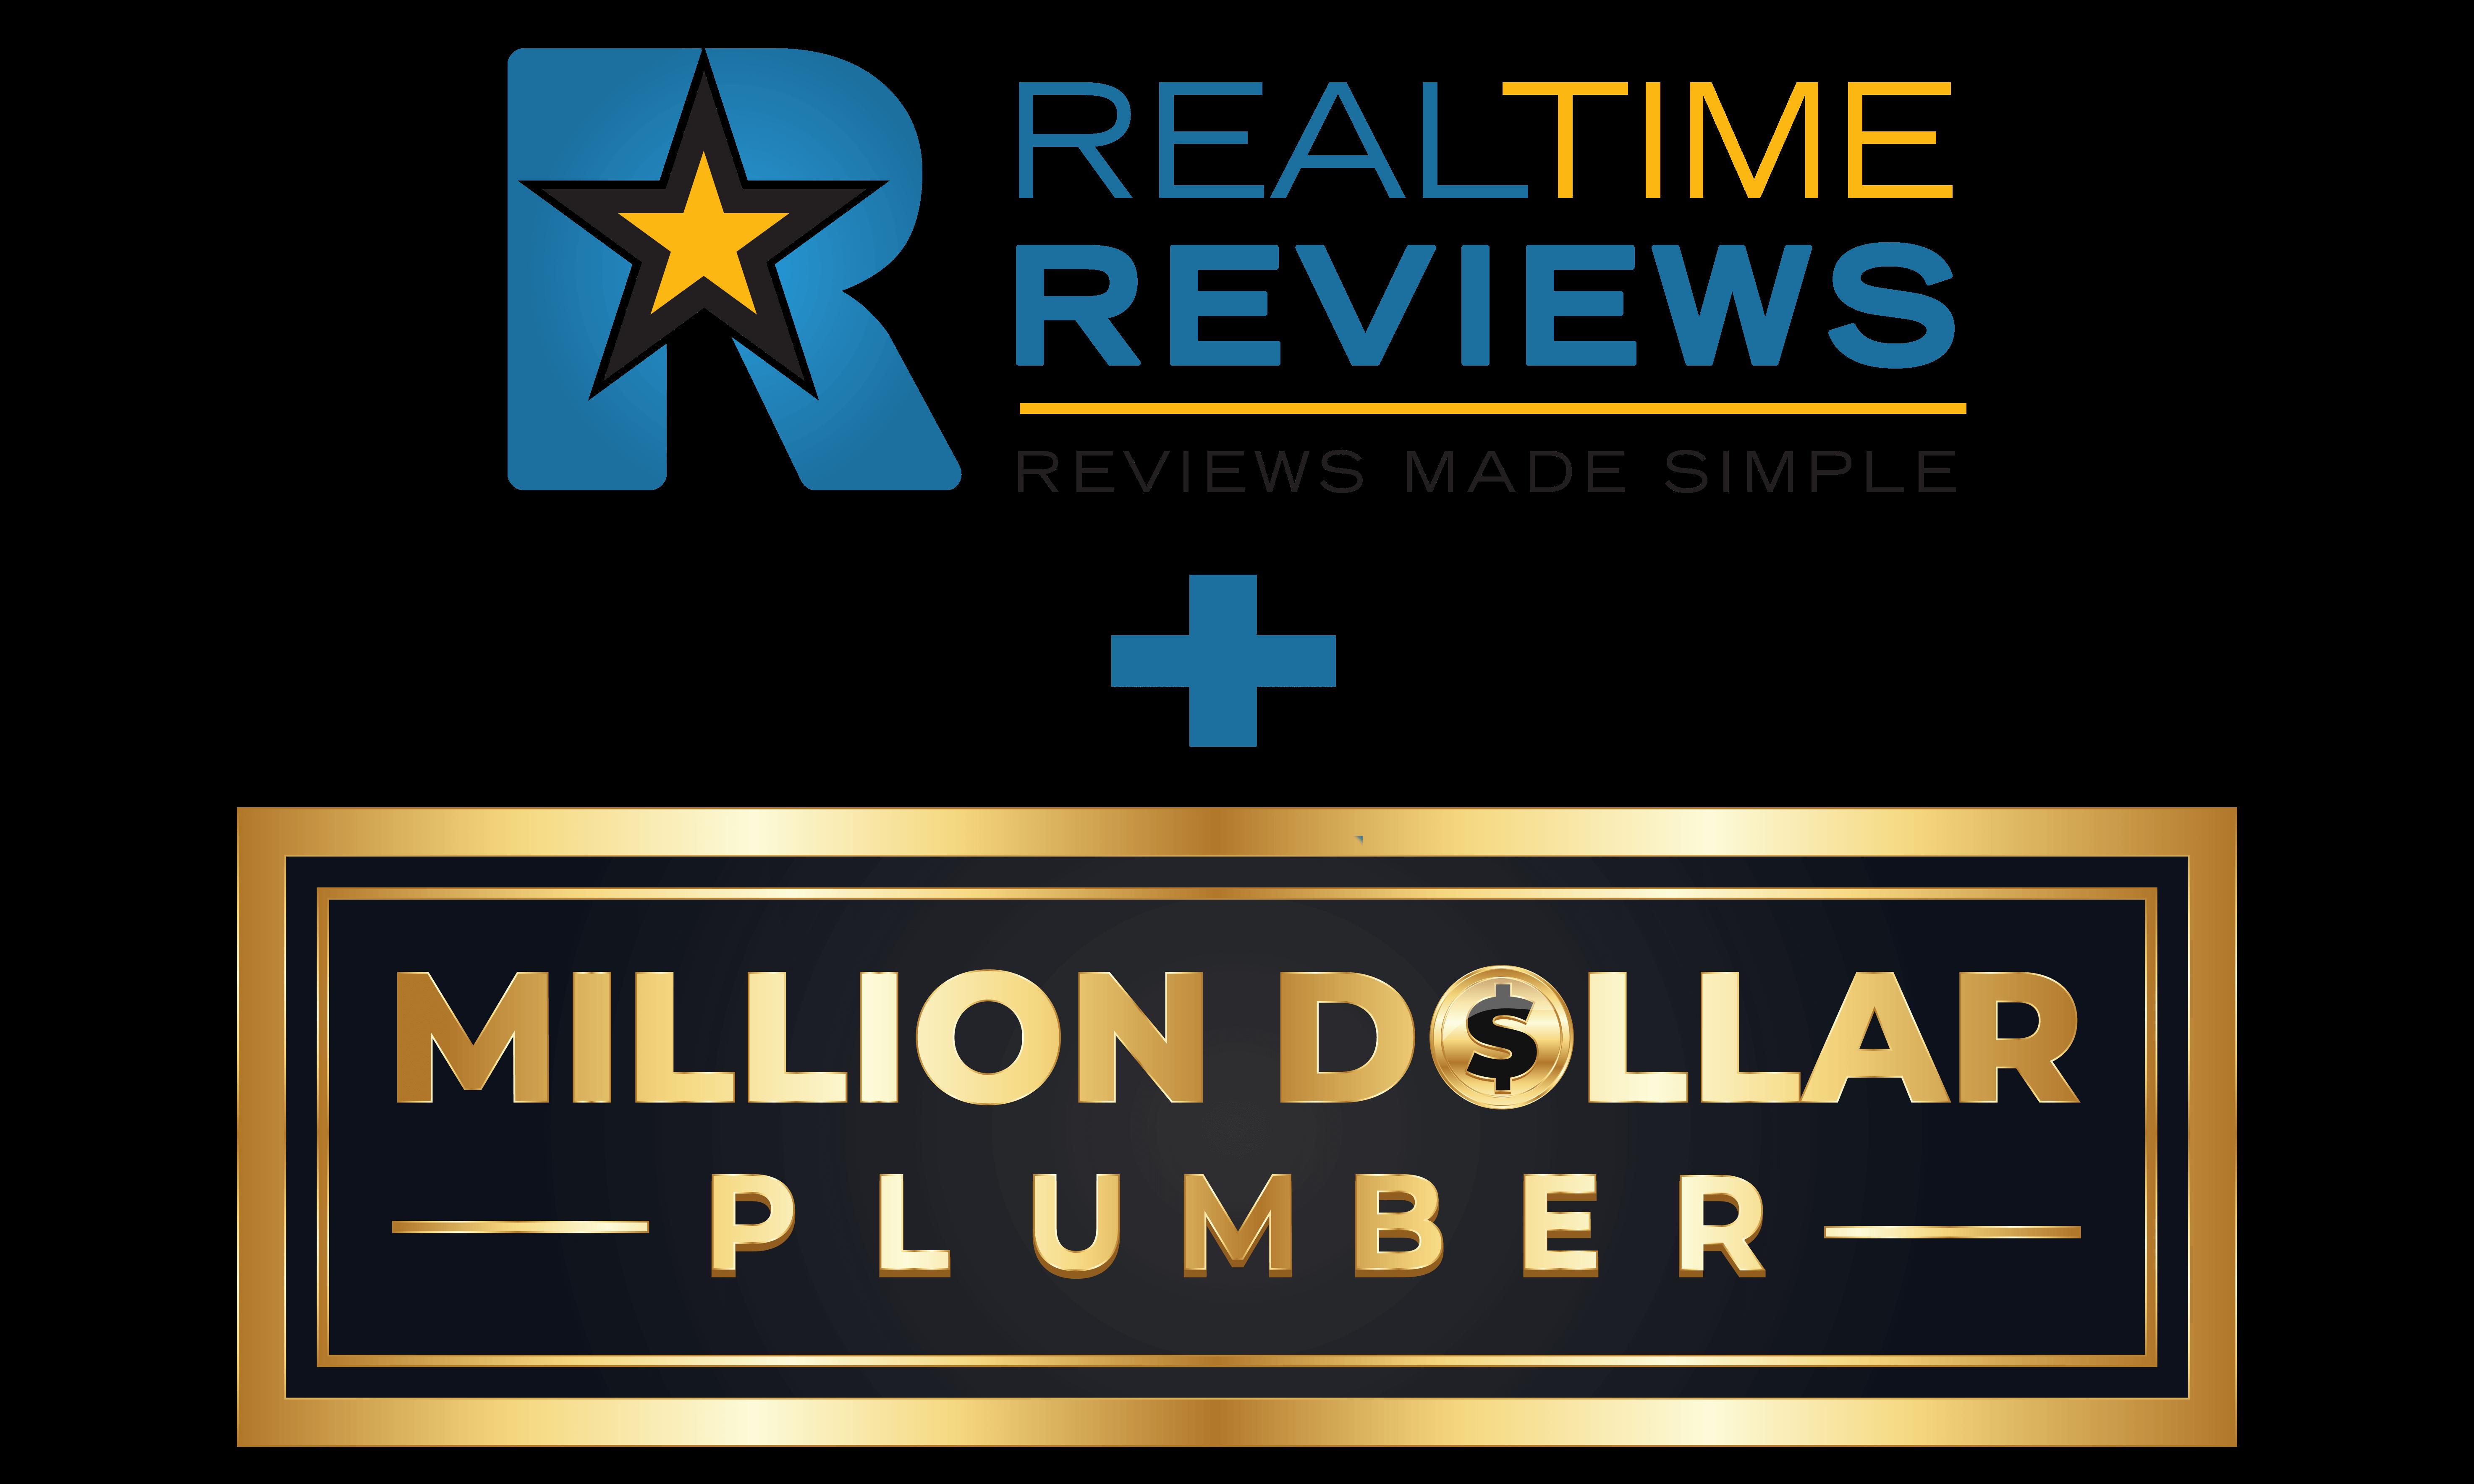 million dollar plumbing